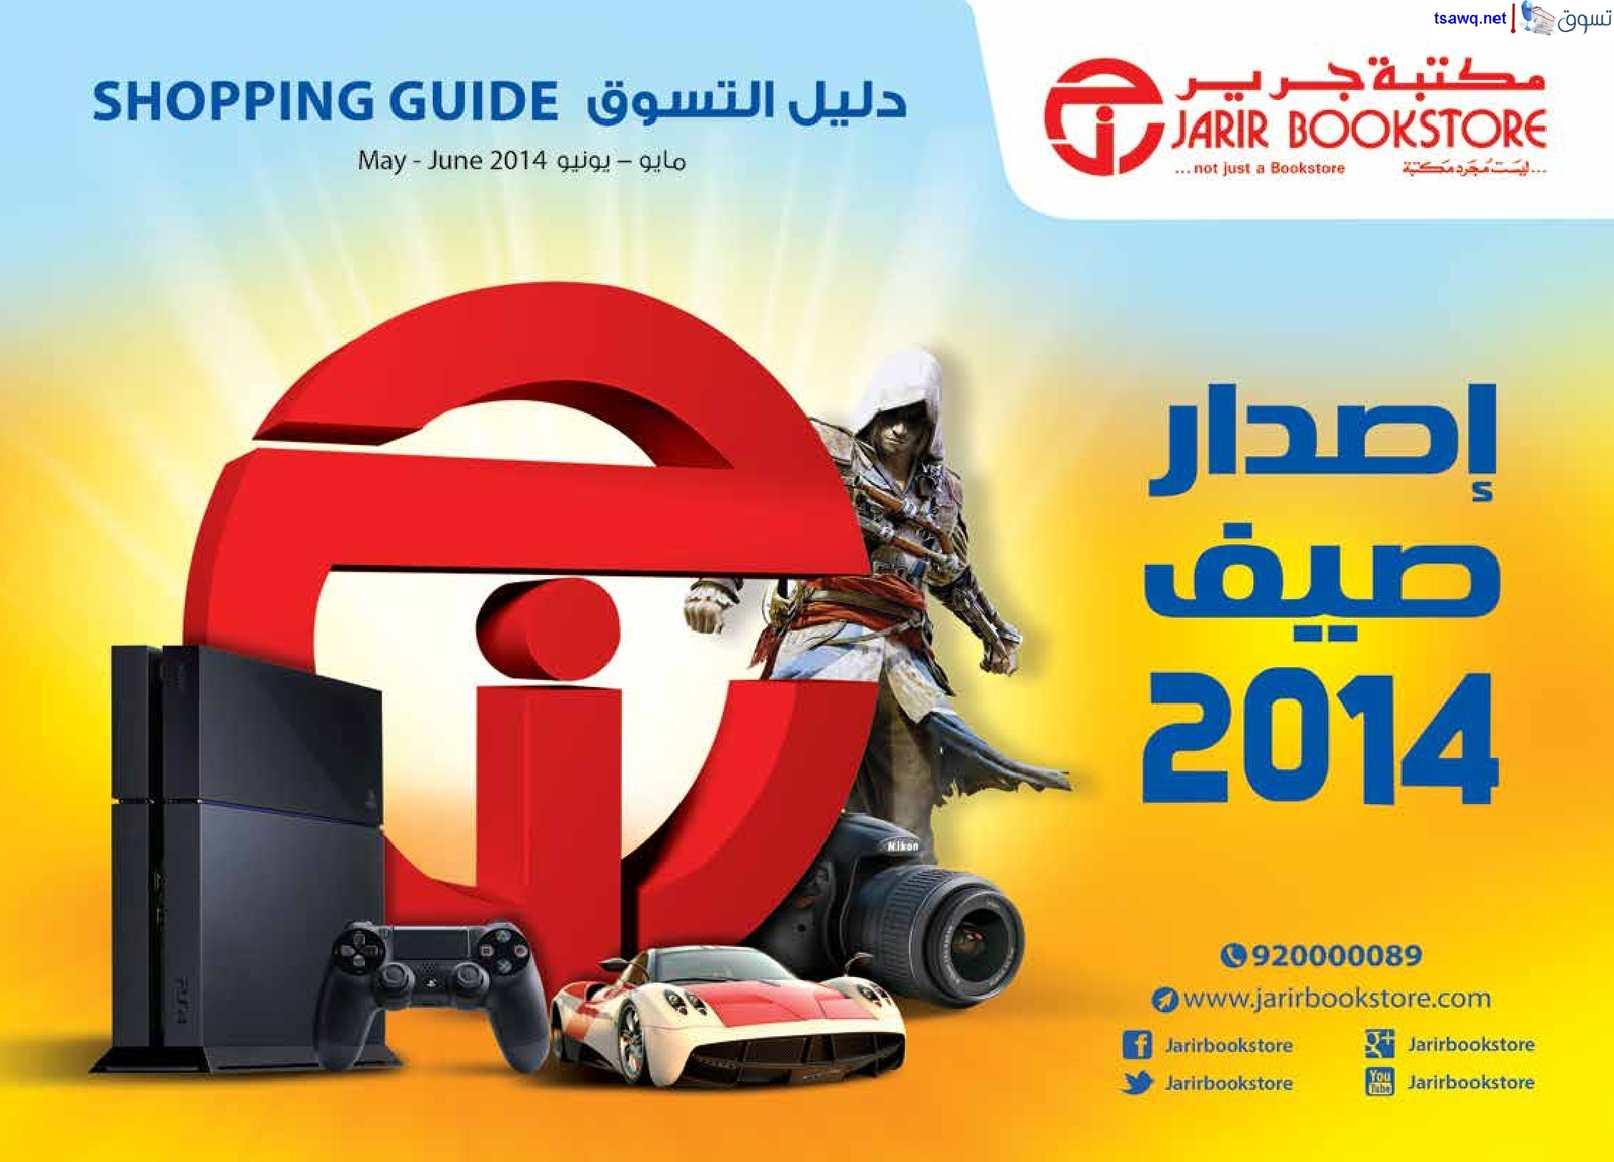 af2ed4bcbc92b Calaméo - دليل التسوق من جرير السعودية مايو - يونيو 2014 إصدار صيف 2014